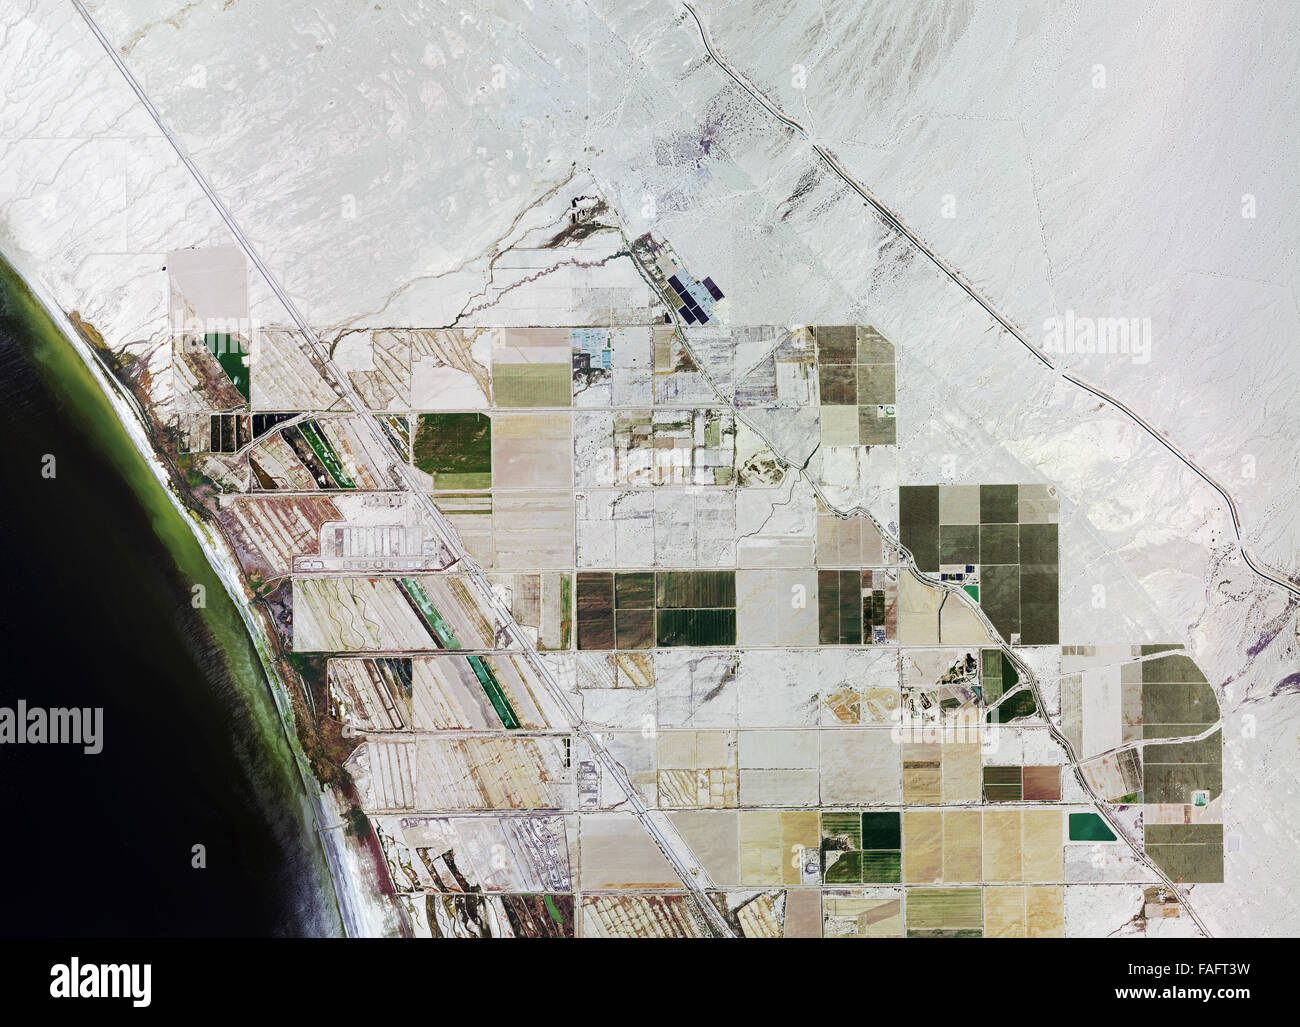 historical aerial photograph of Salton Sea, Niland, Imperial County, California - Stock Image